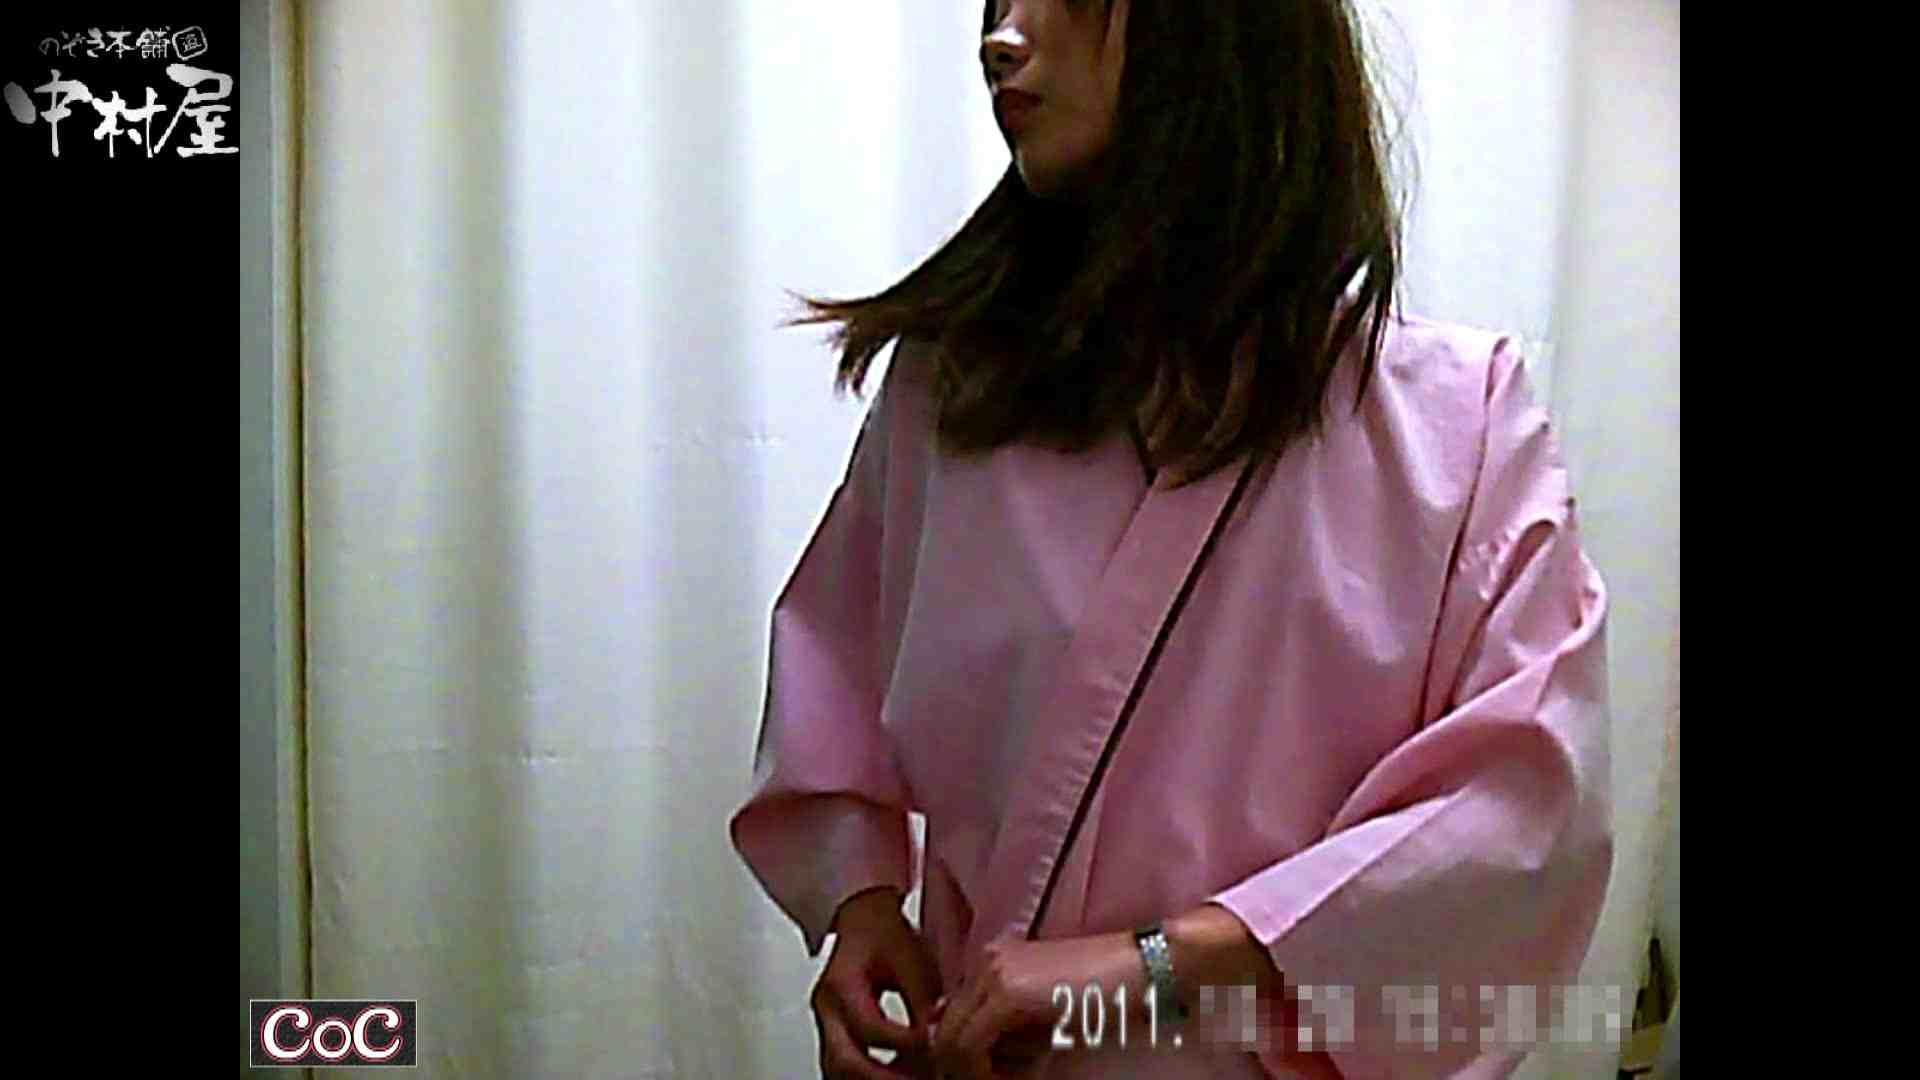 Doctor-X元医者による反抗vol.64後編 おまんこ見放題 | 盗撮シリーズ  104PIX 87